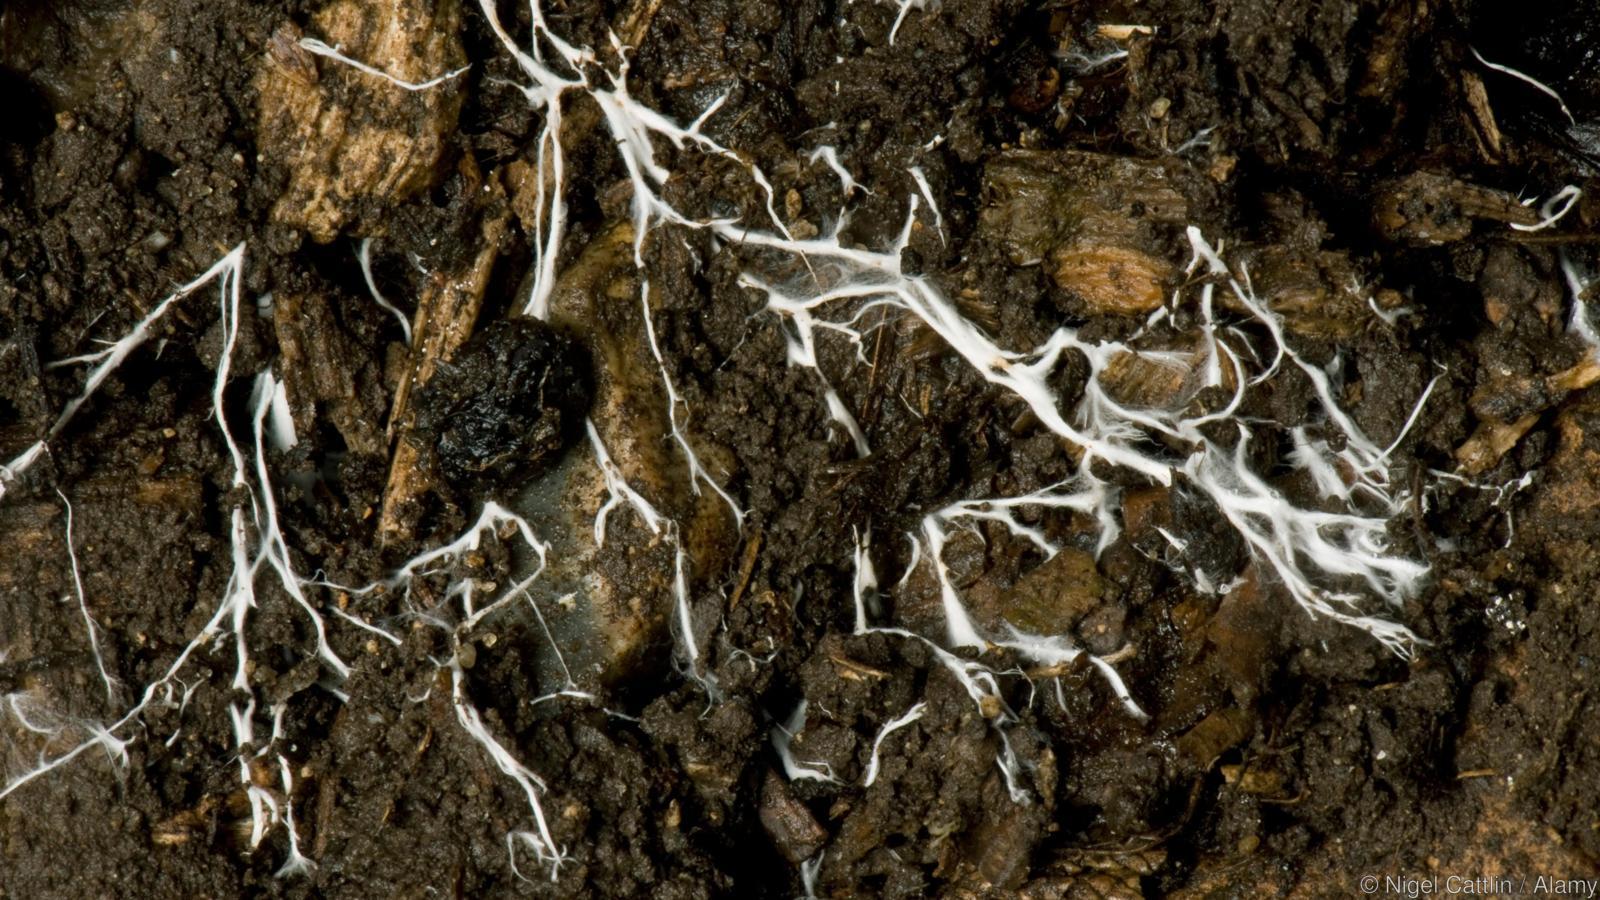 D52RCW Branching threads of fungus mycelium in organic soil